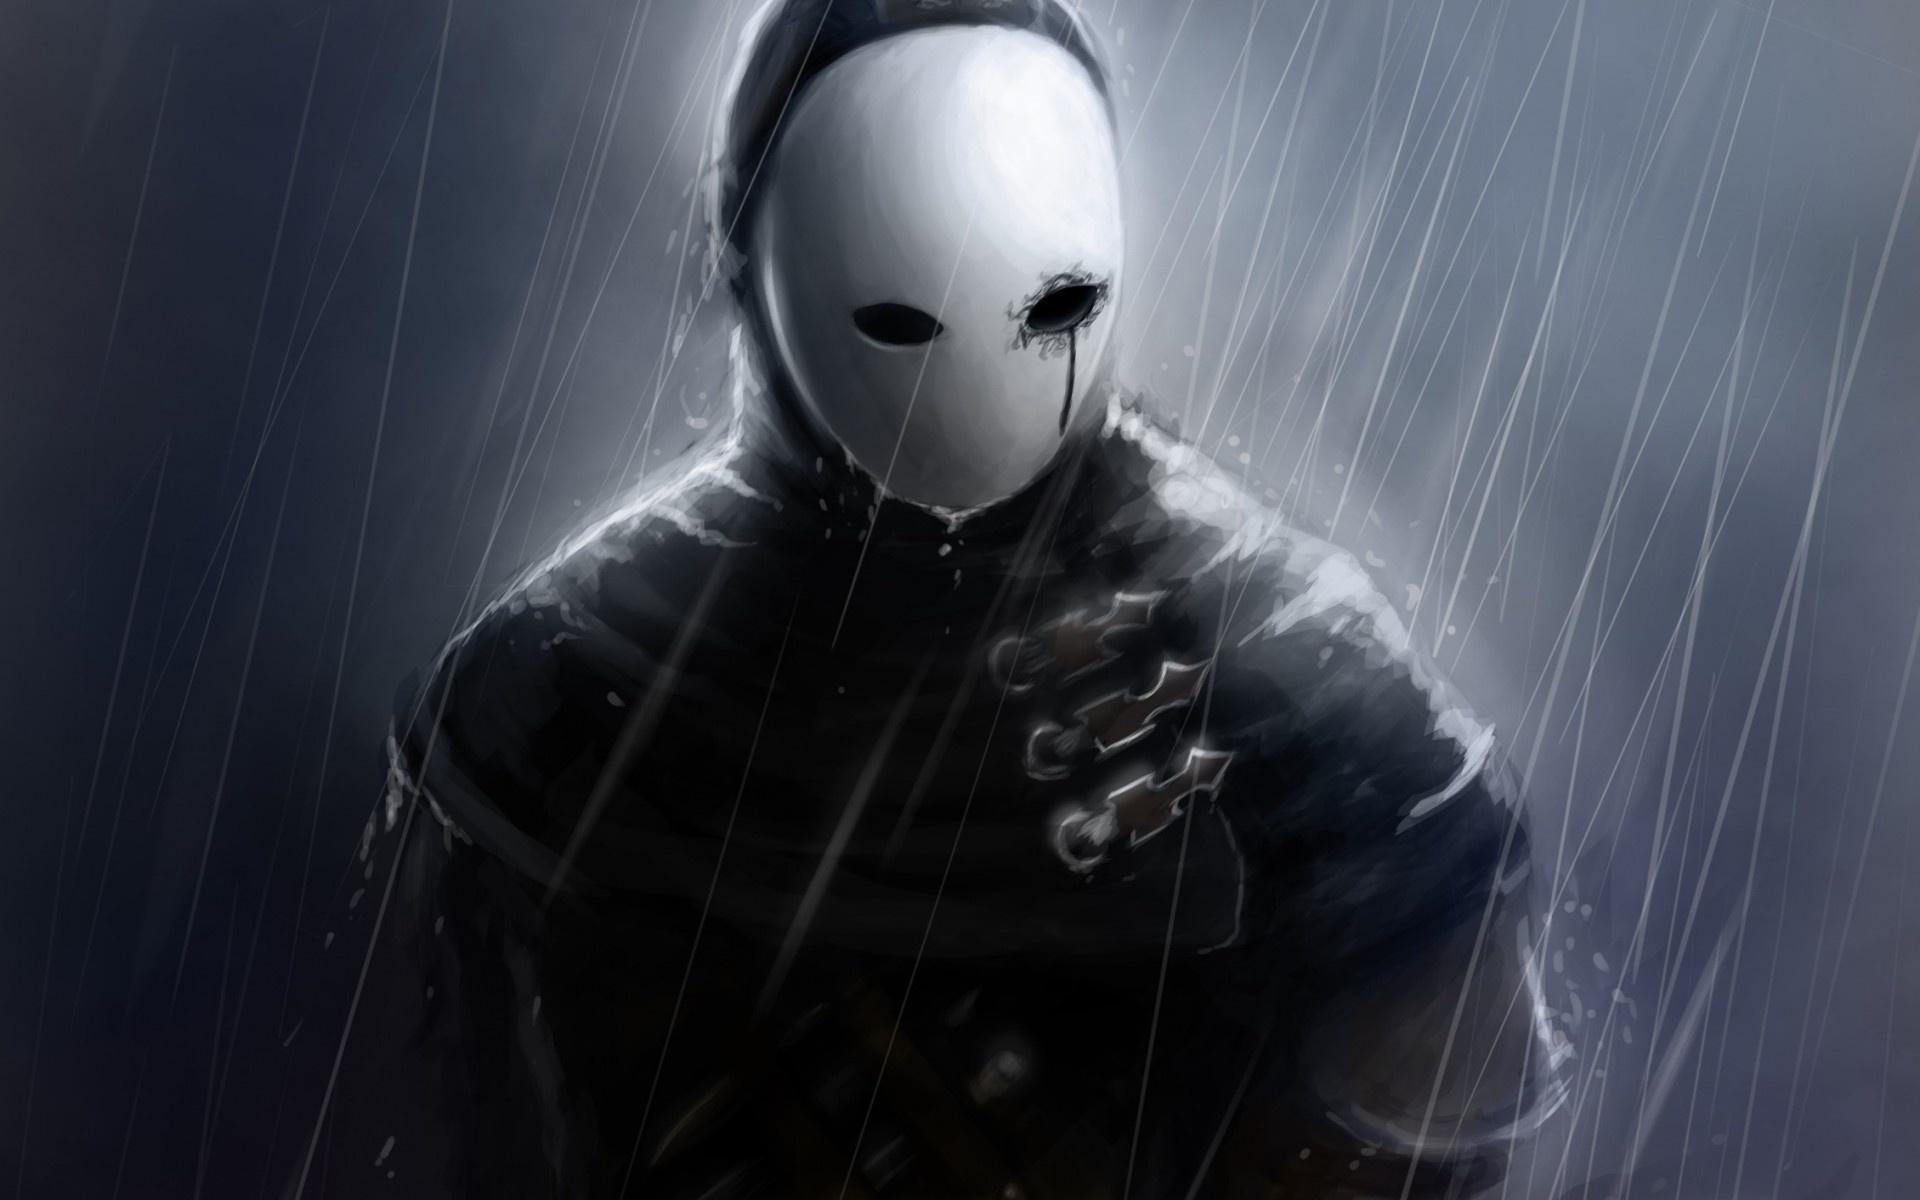 Hd Background Anonymous Mask Hacker Group Machete Jacket Wallpaper 1920x1200